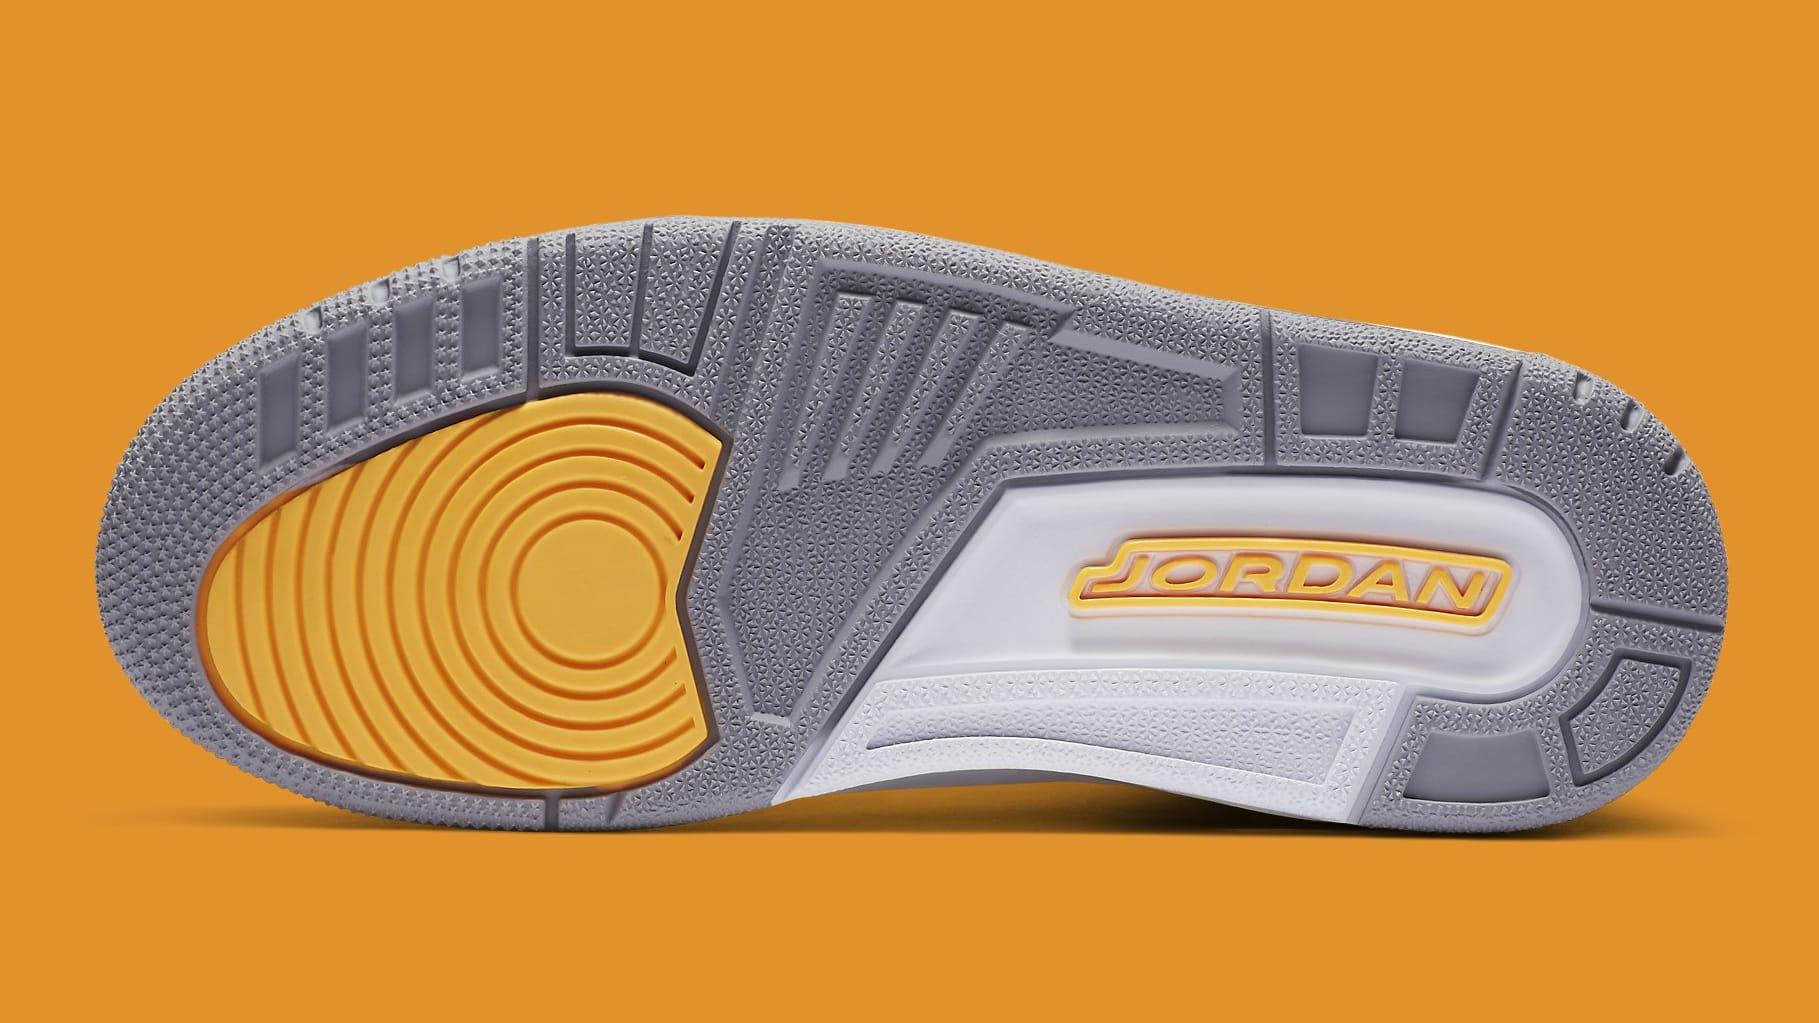 Air Jordan 3 III Laser Orange Release Date CK9246-108 Sole